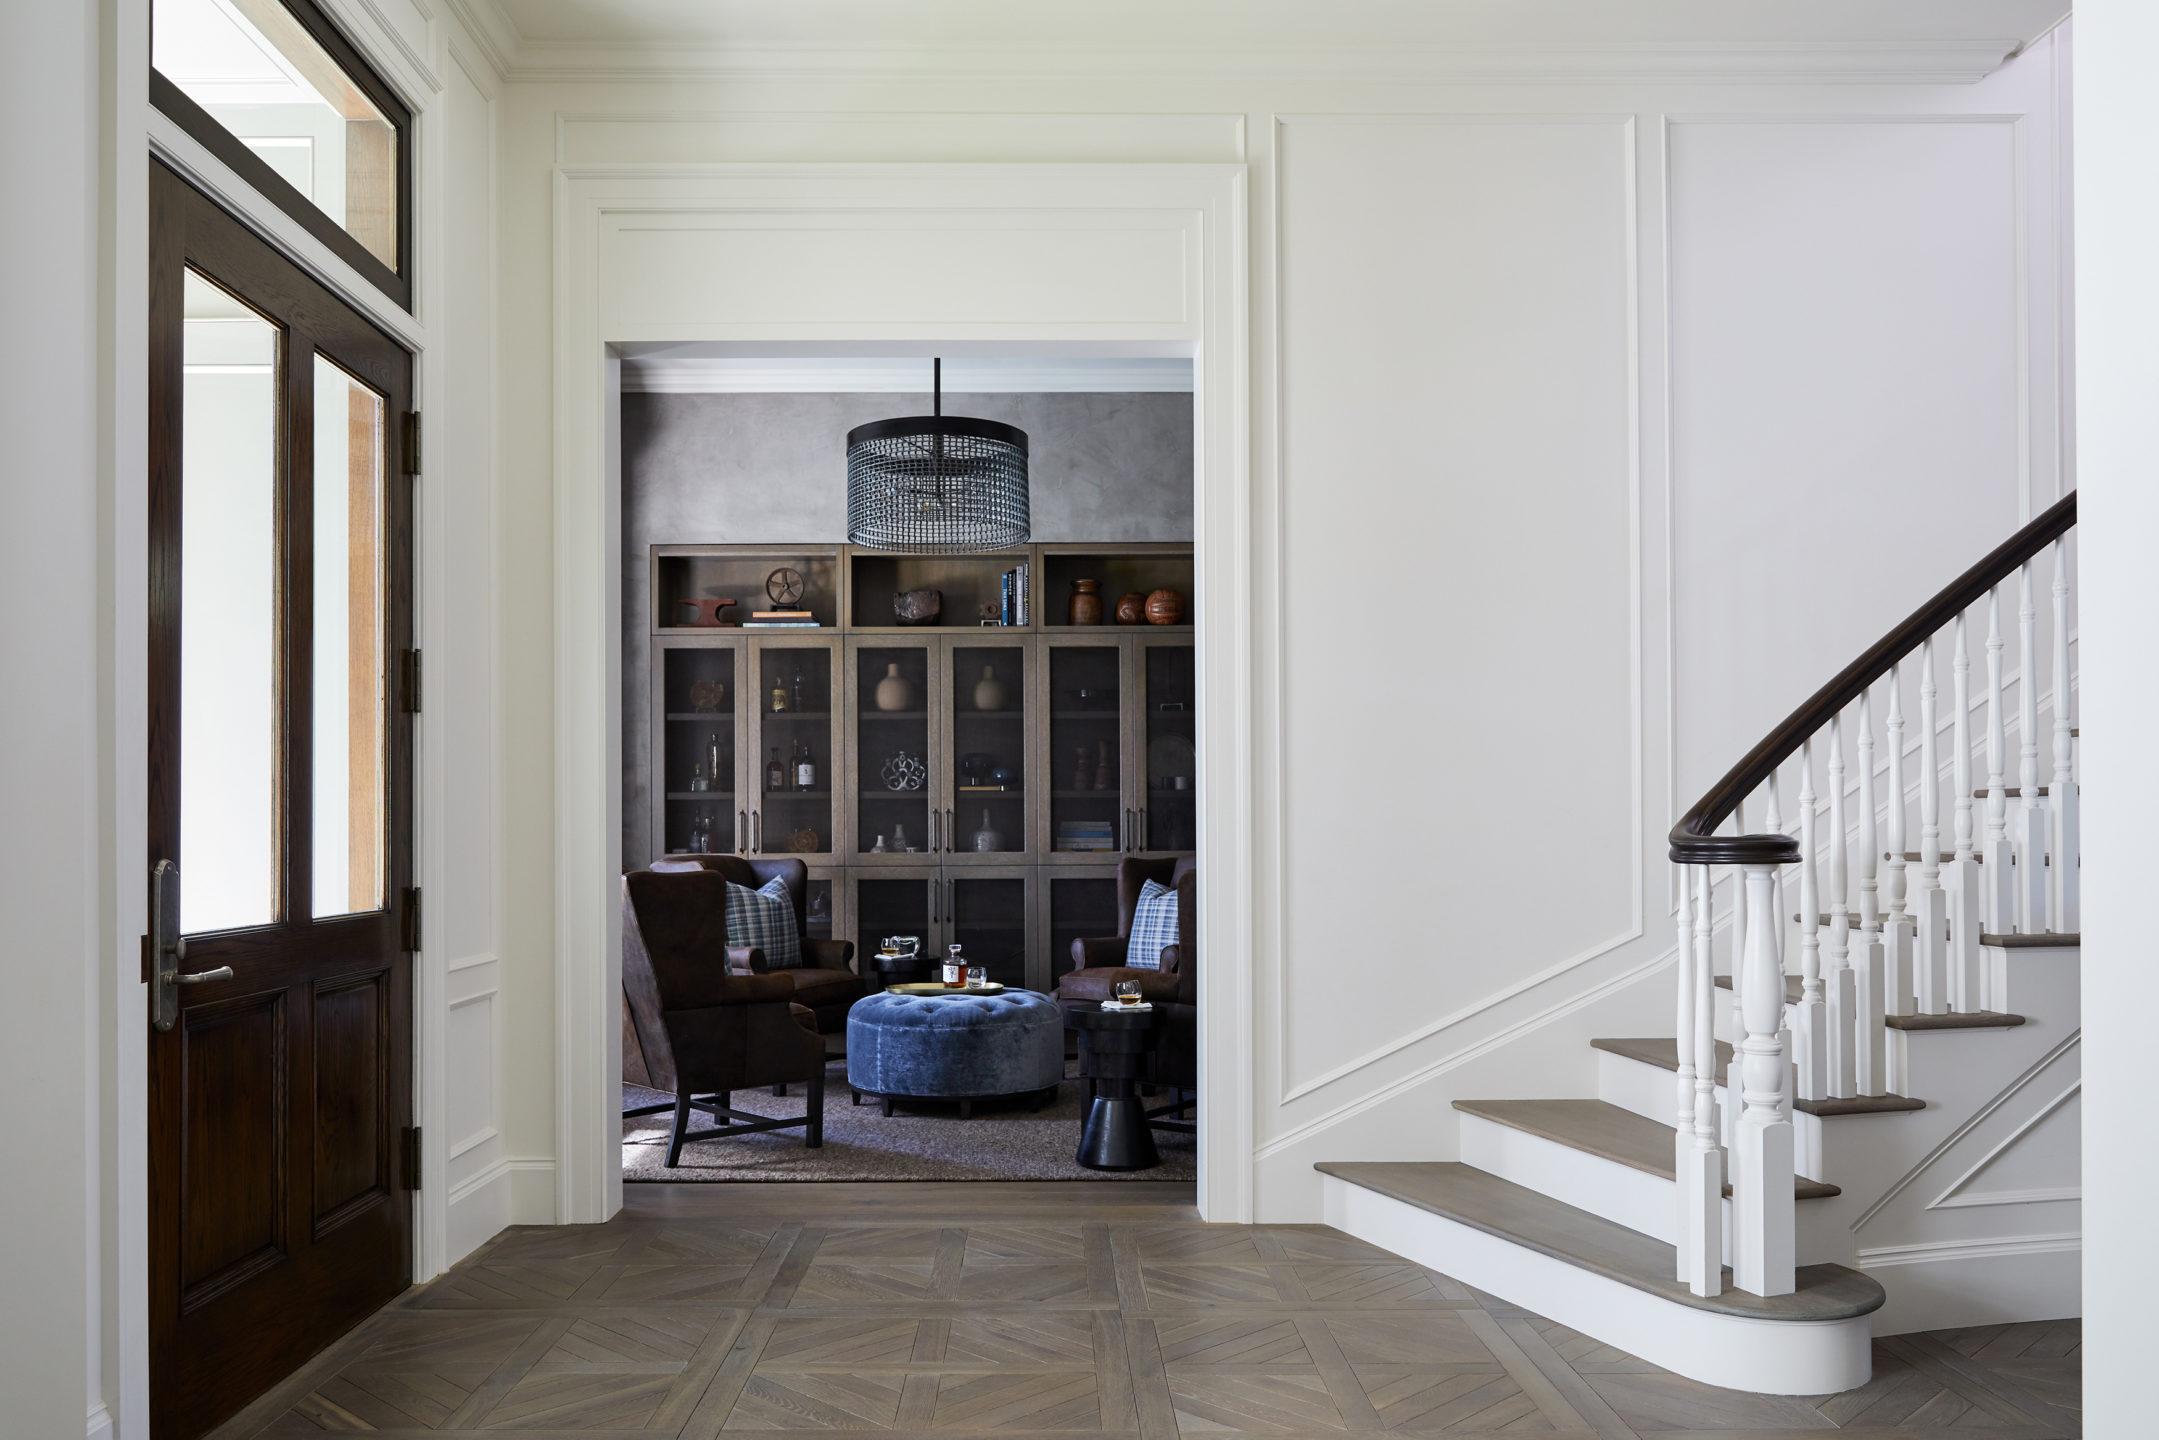 Jennifer_robins_interiors_projects_healdsburg_8_entryway_lookthrough_office_staircase_vert